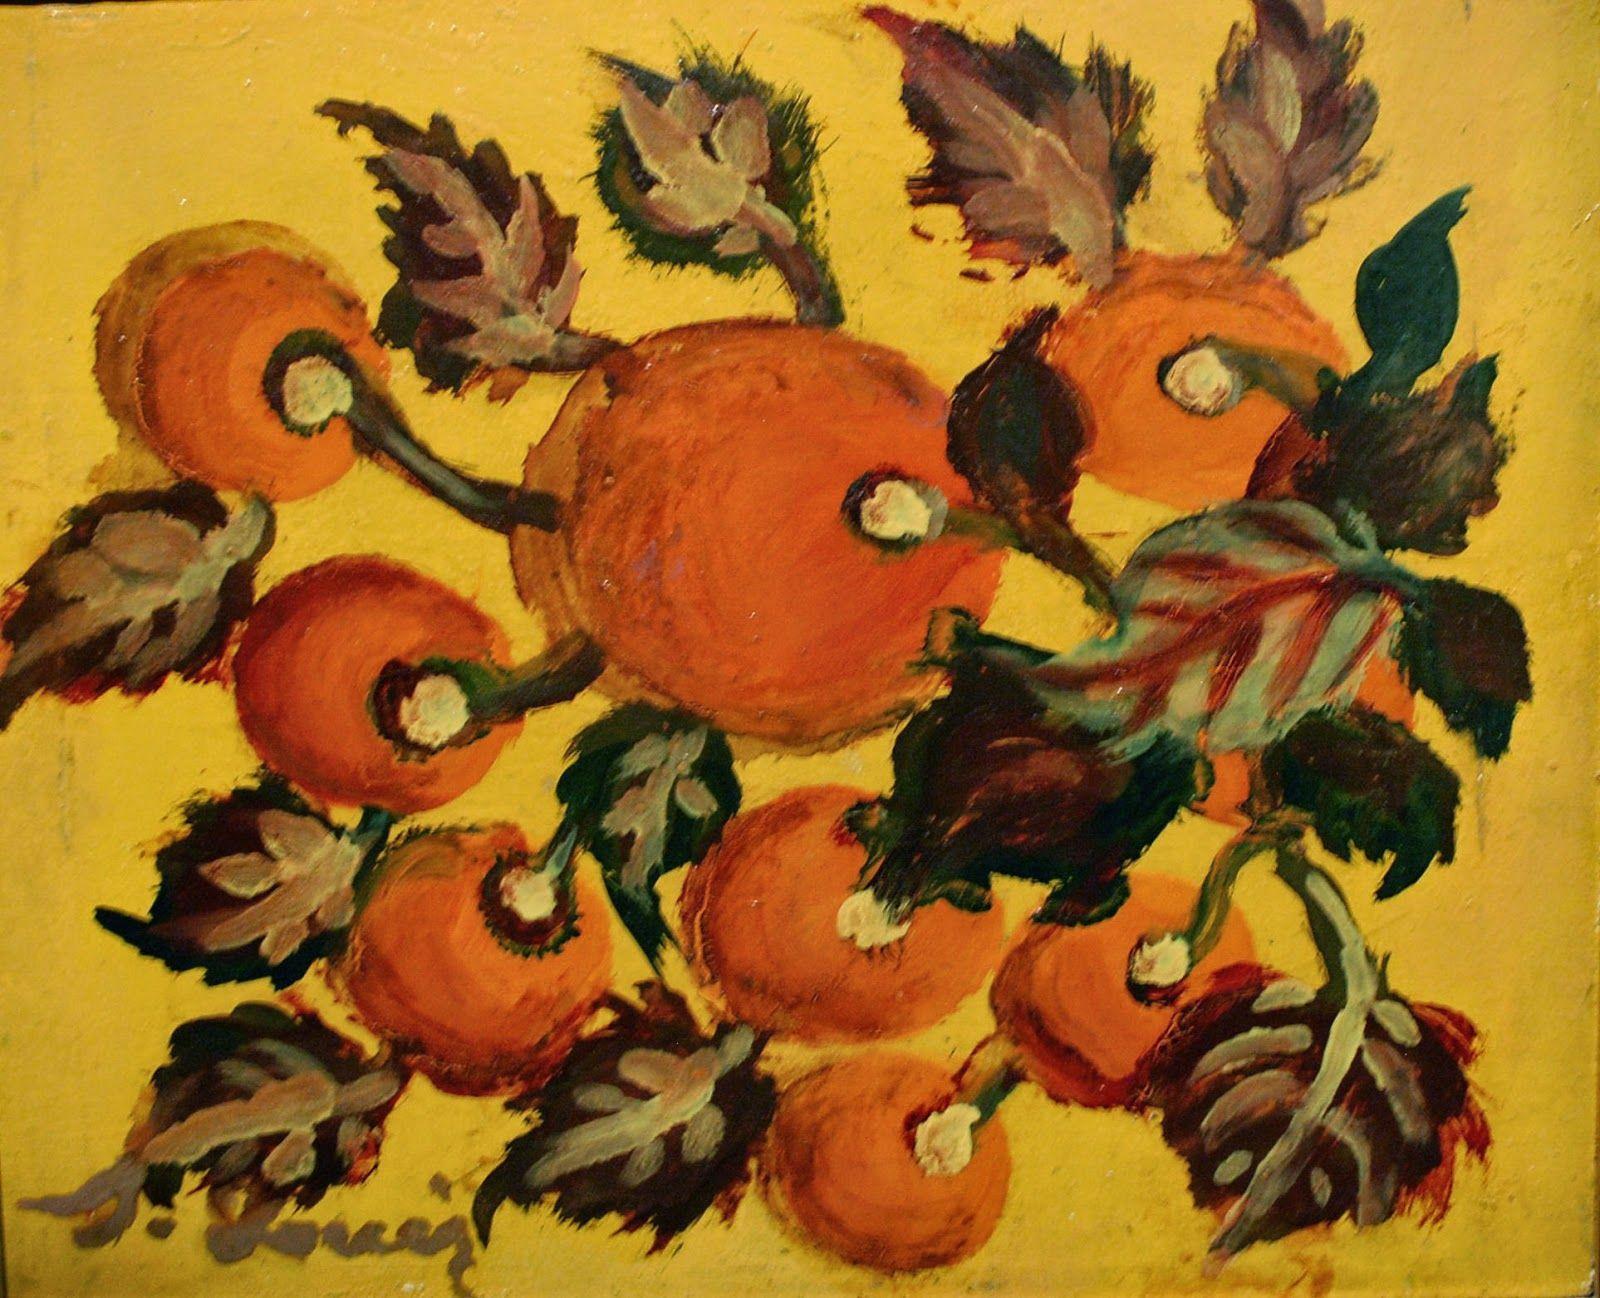 Branche de fruits by Louis Seraphine (Southwest France: Naif Museum)